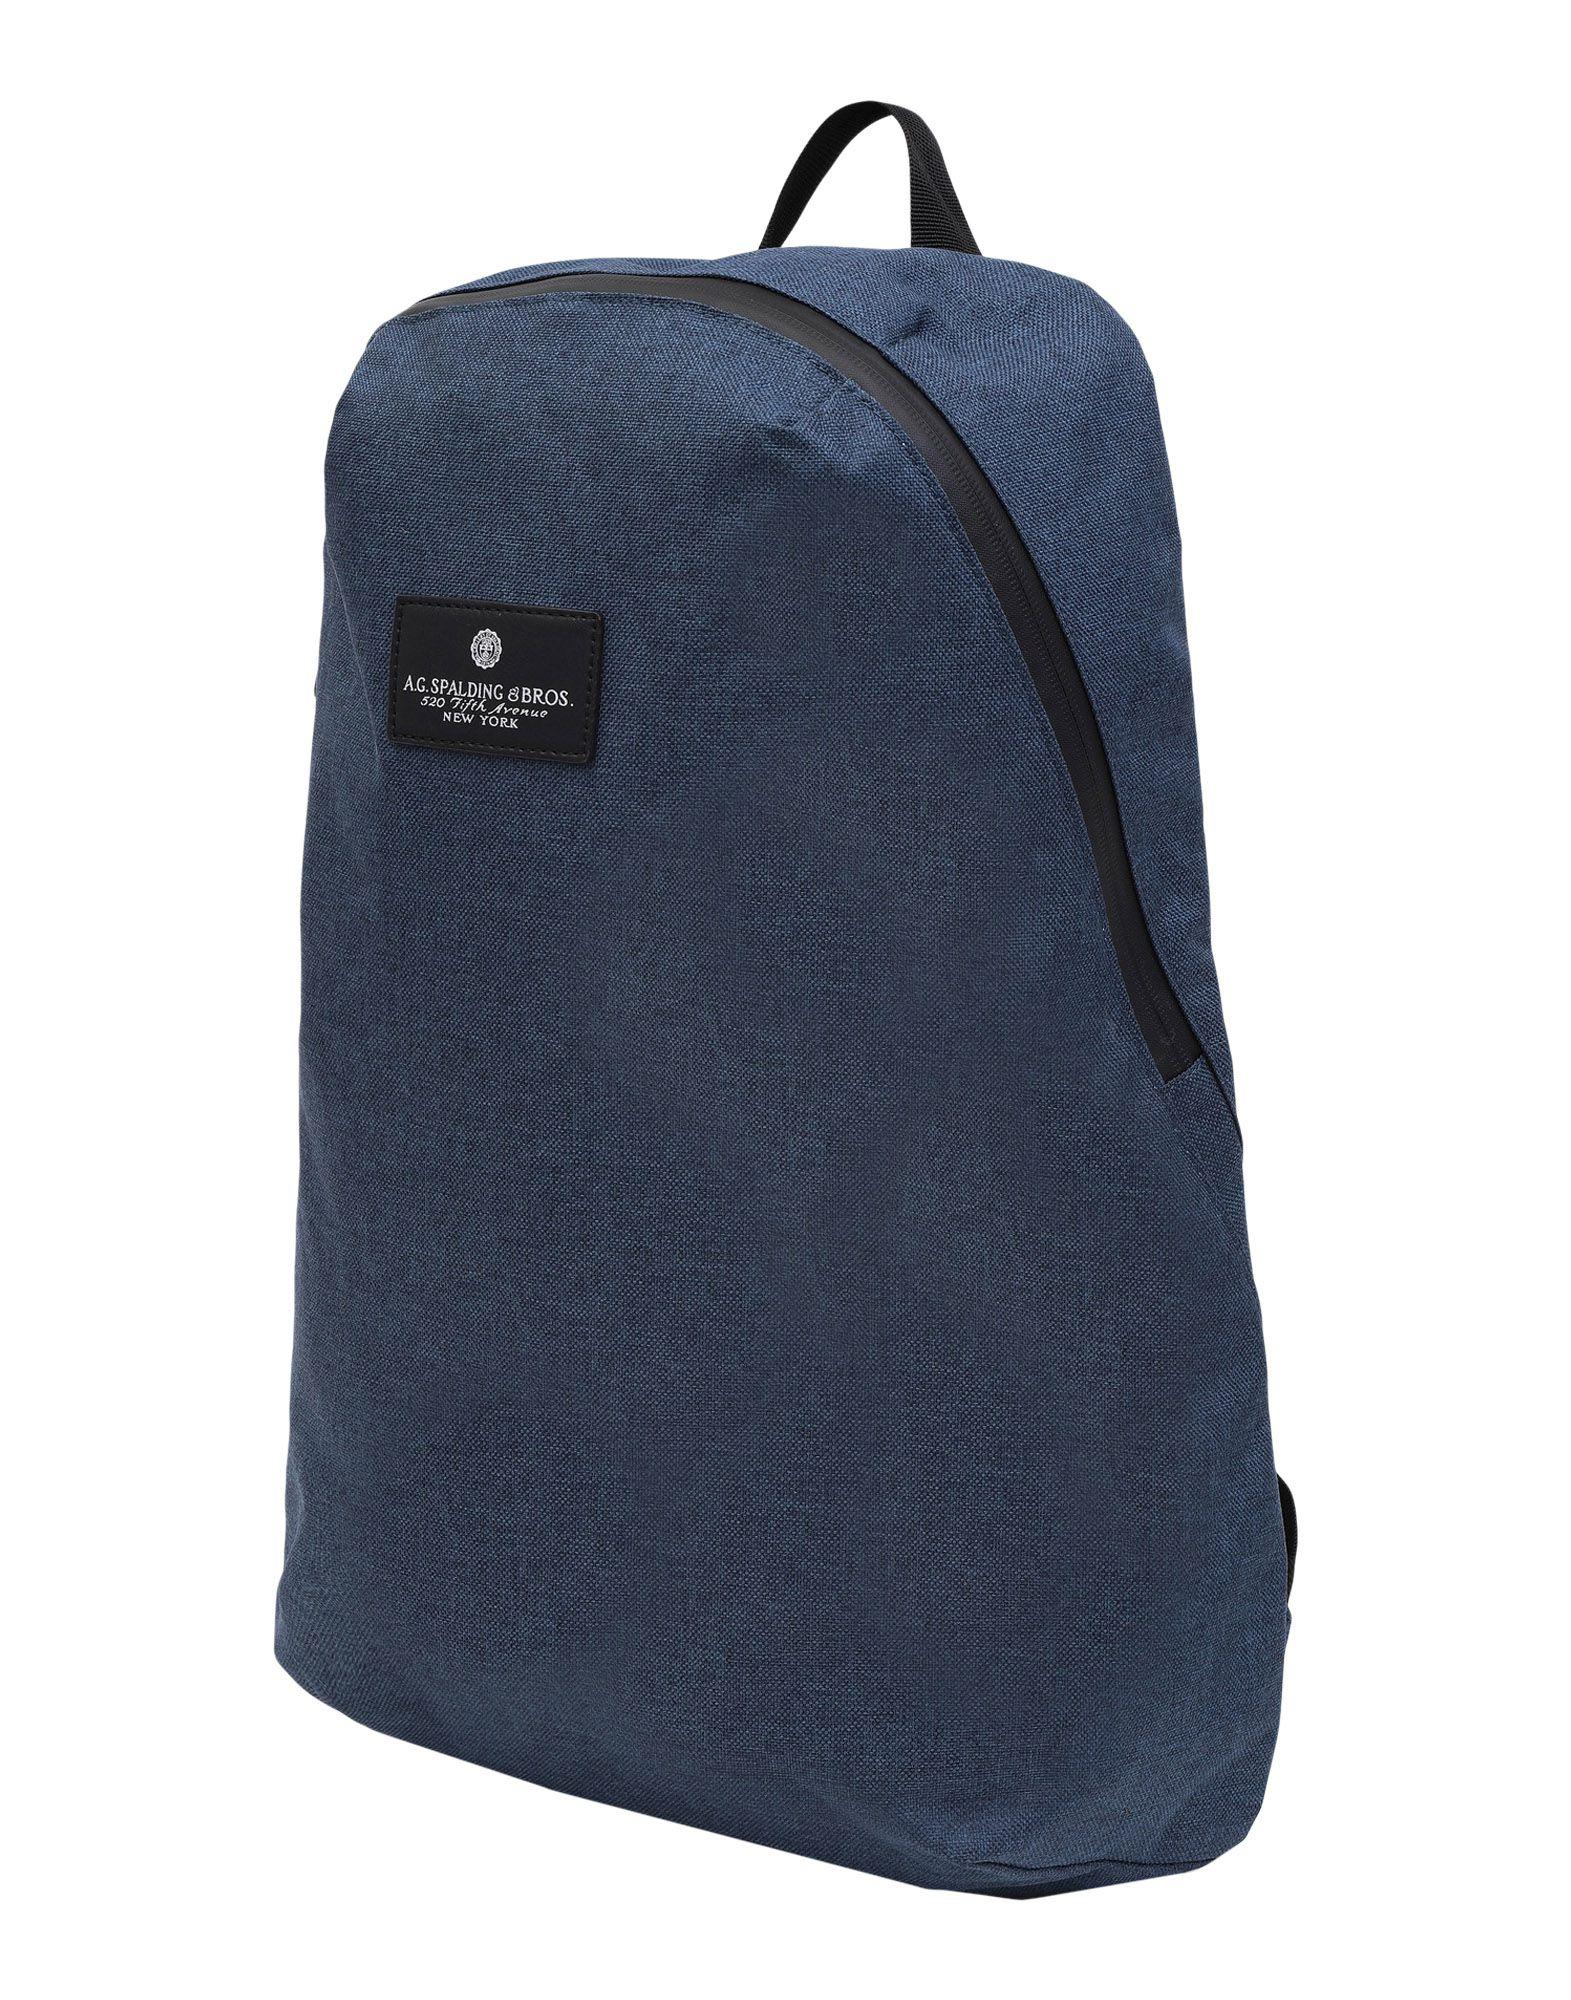 A.G. SPALDING & BROS. 520 FIFTH AVENUE New York Рюкзаки и сумки на пояс spalding мяч баскетбольный spalding nba gold series